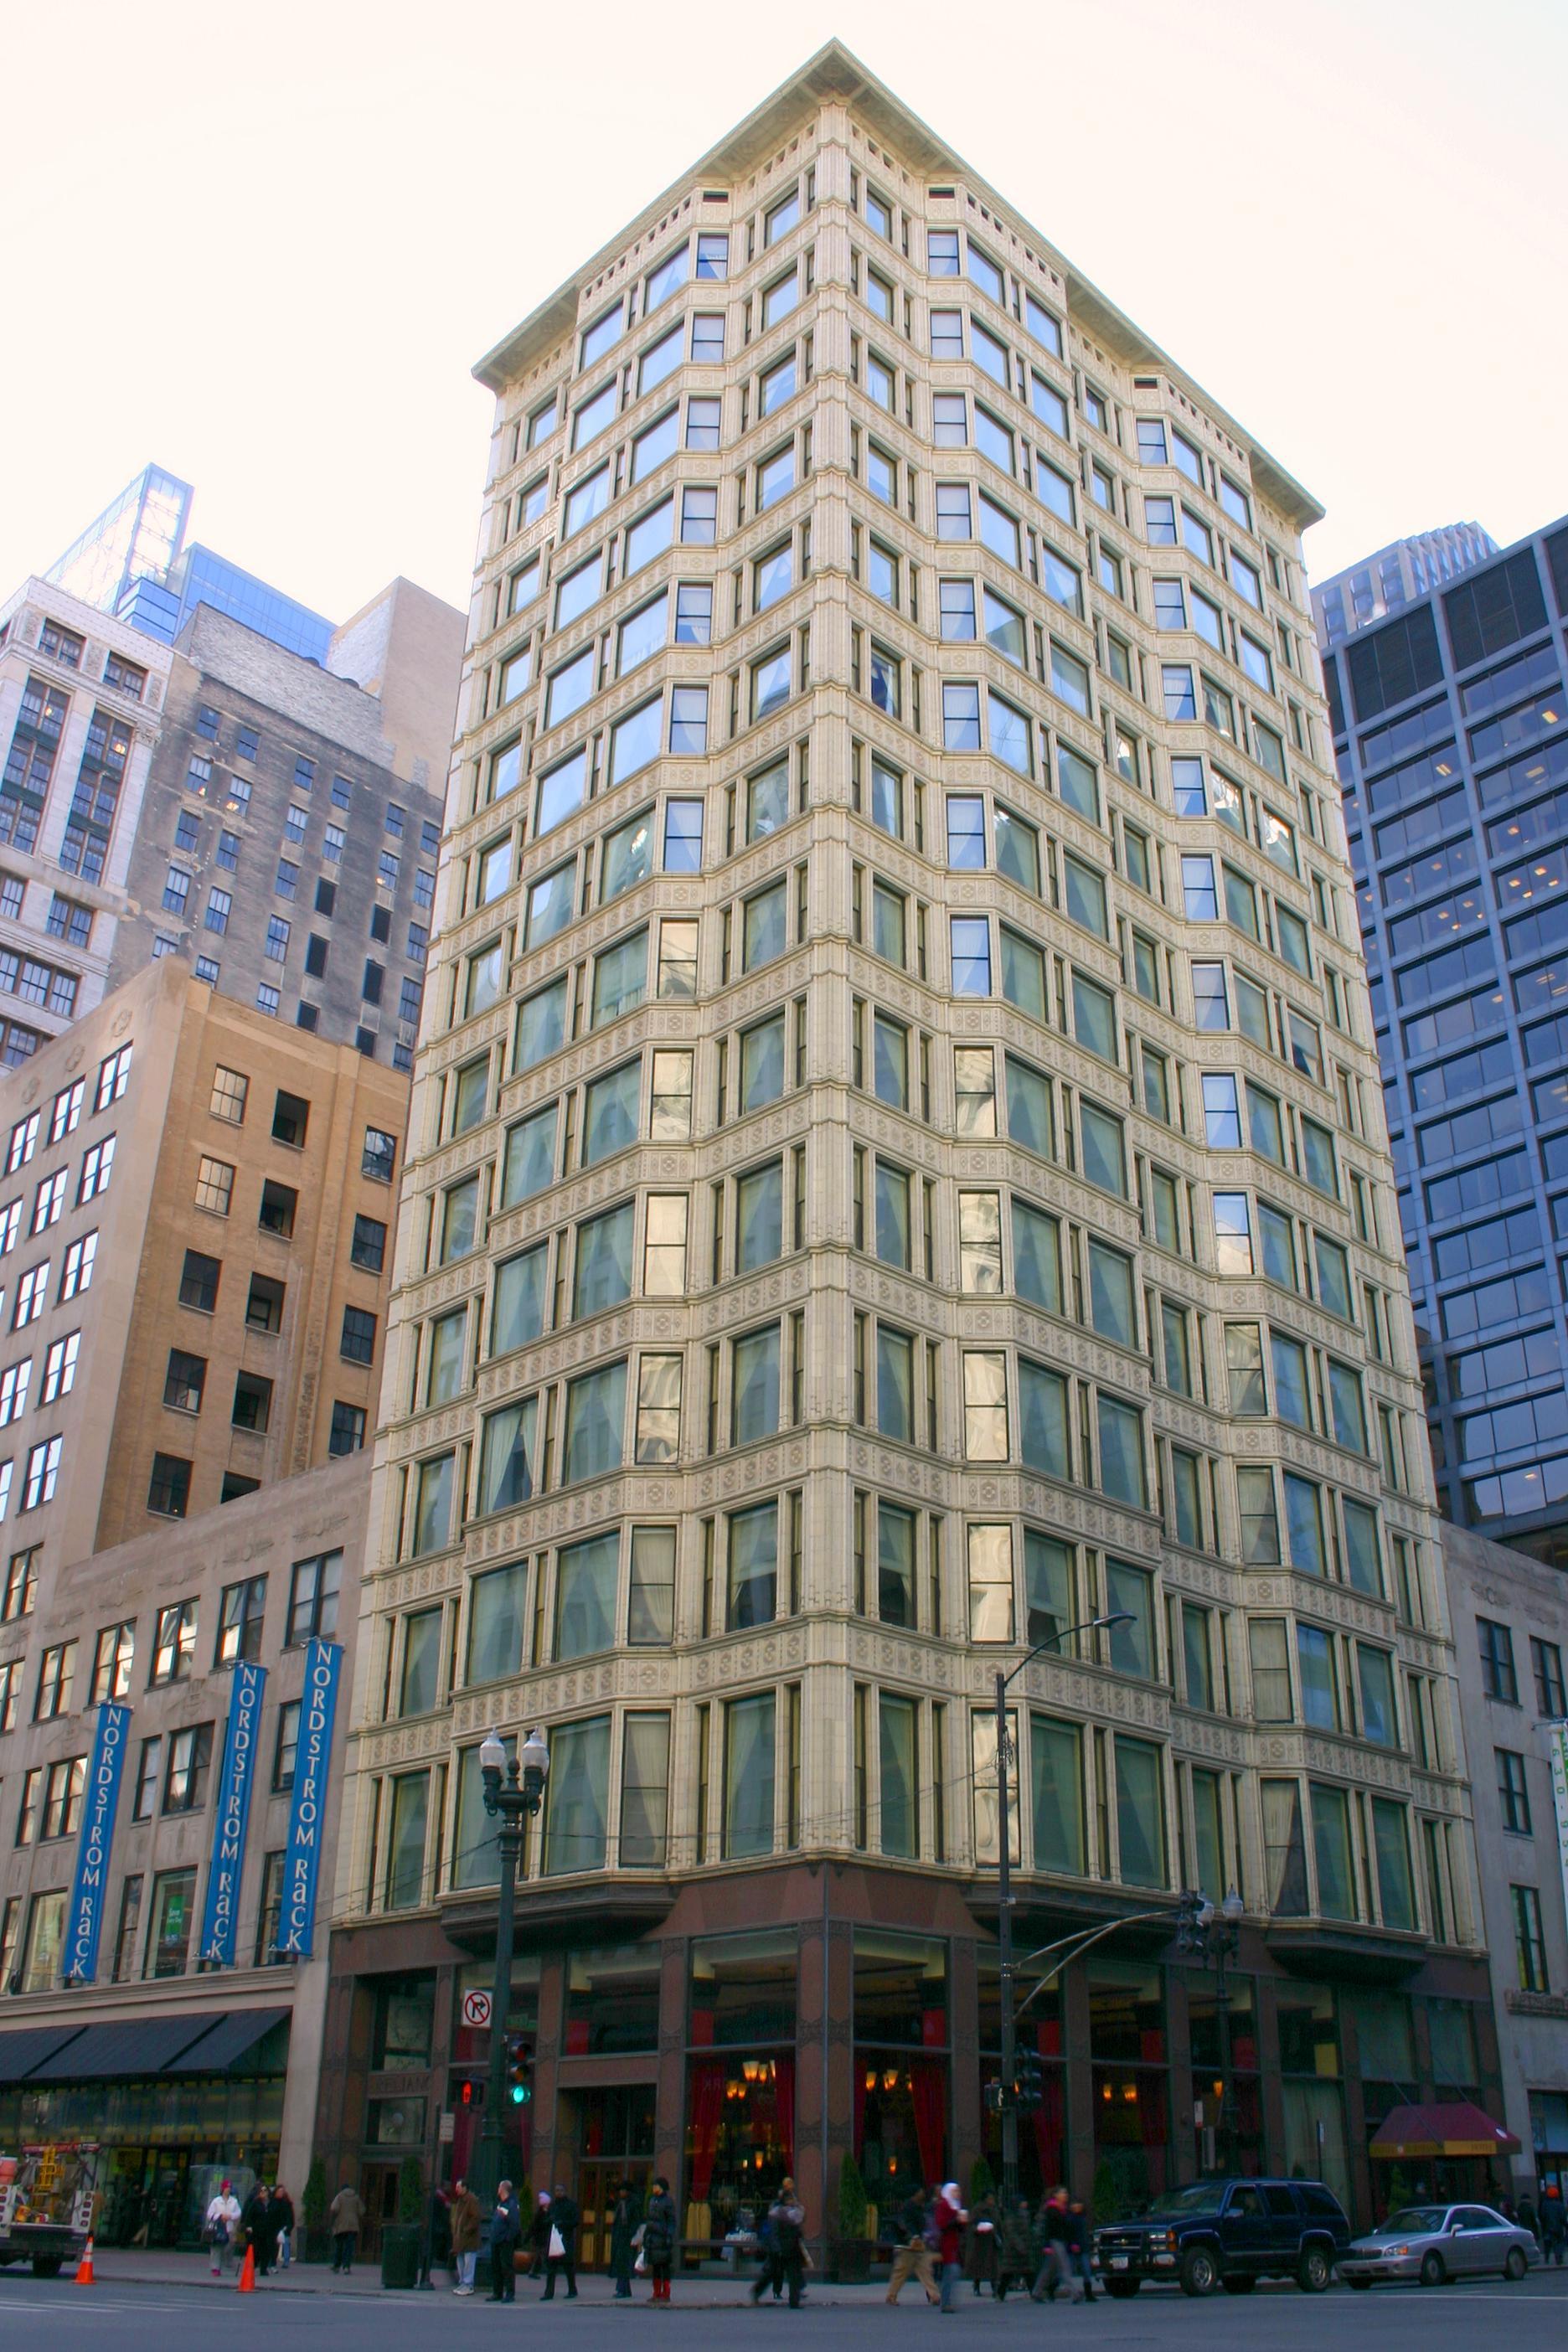 Archivo:2010-03-03 1872x2808 chicago reliance building jpg